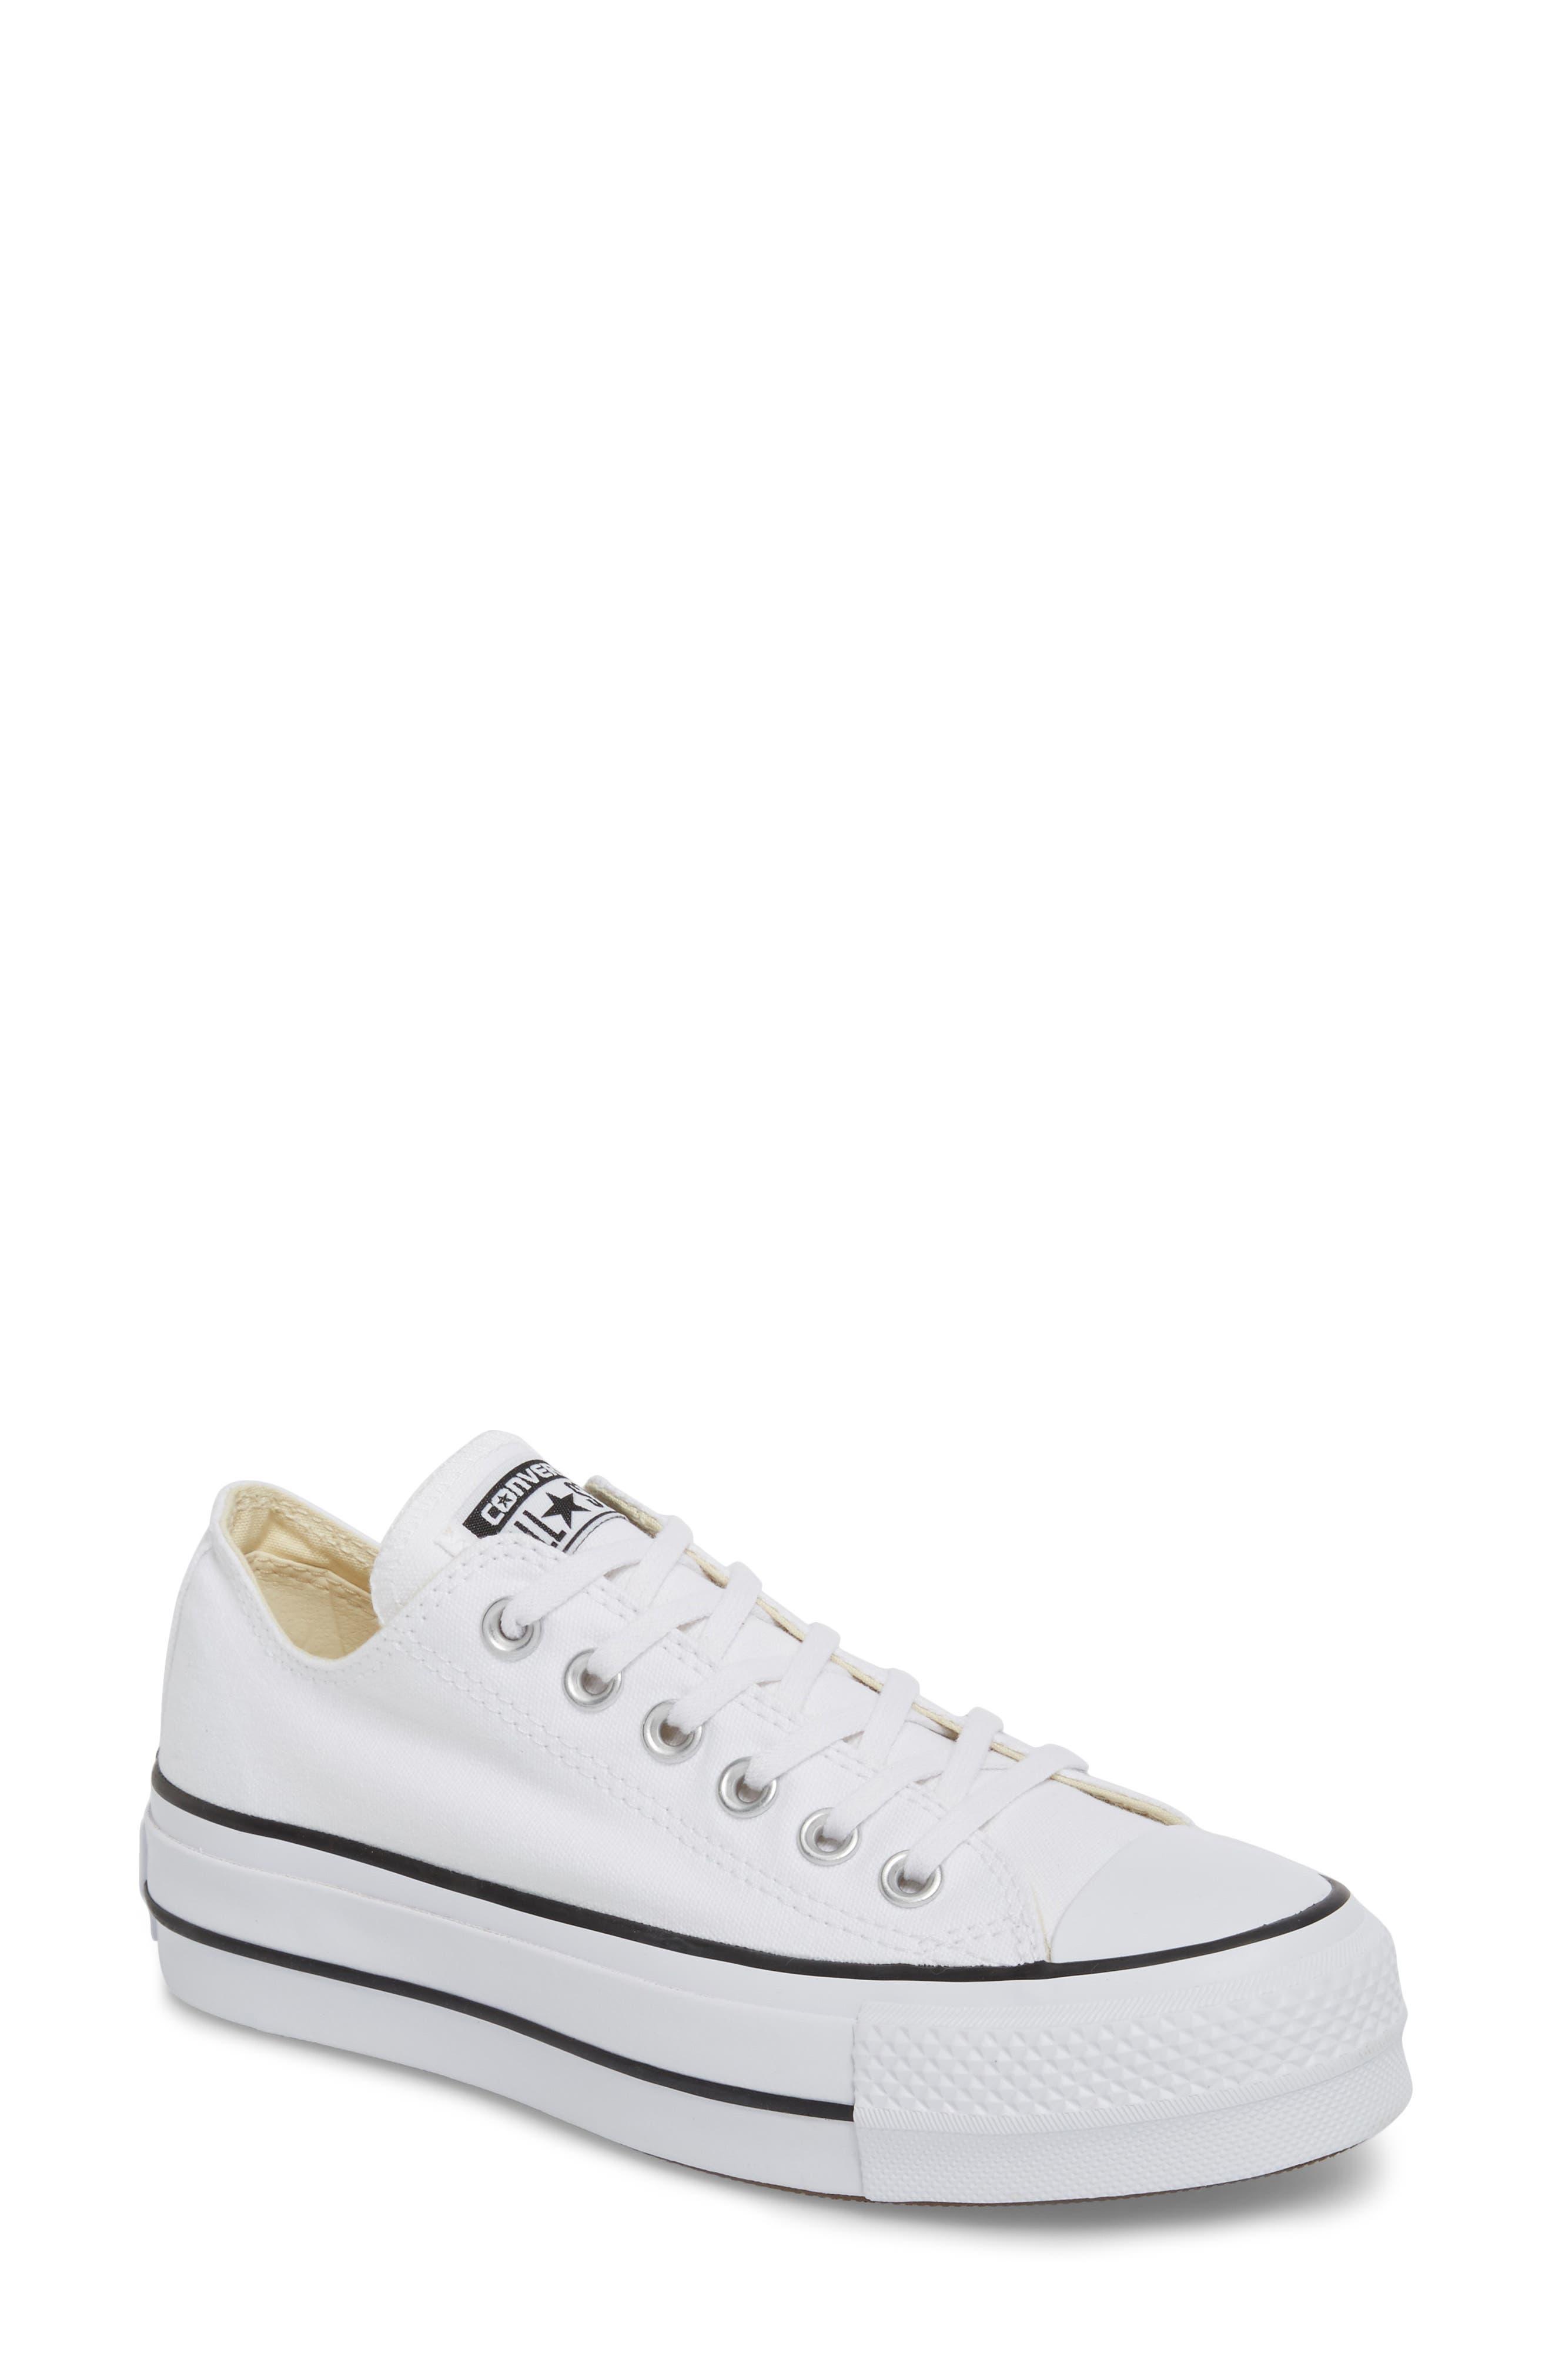 Converse Chuck Taylor All Star Platform Sneaker- White